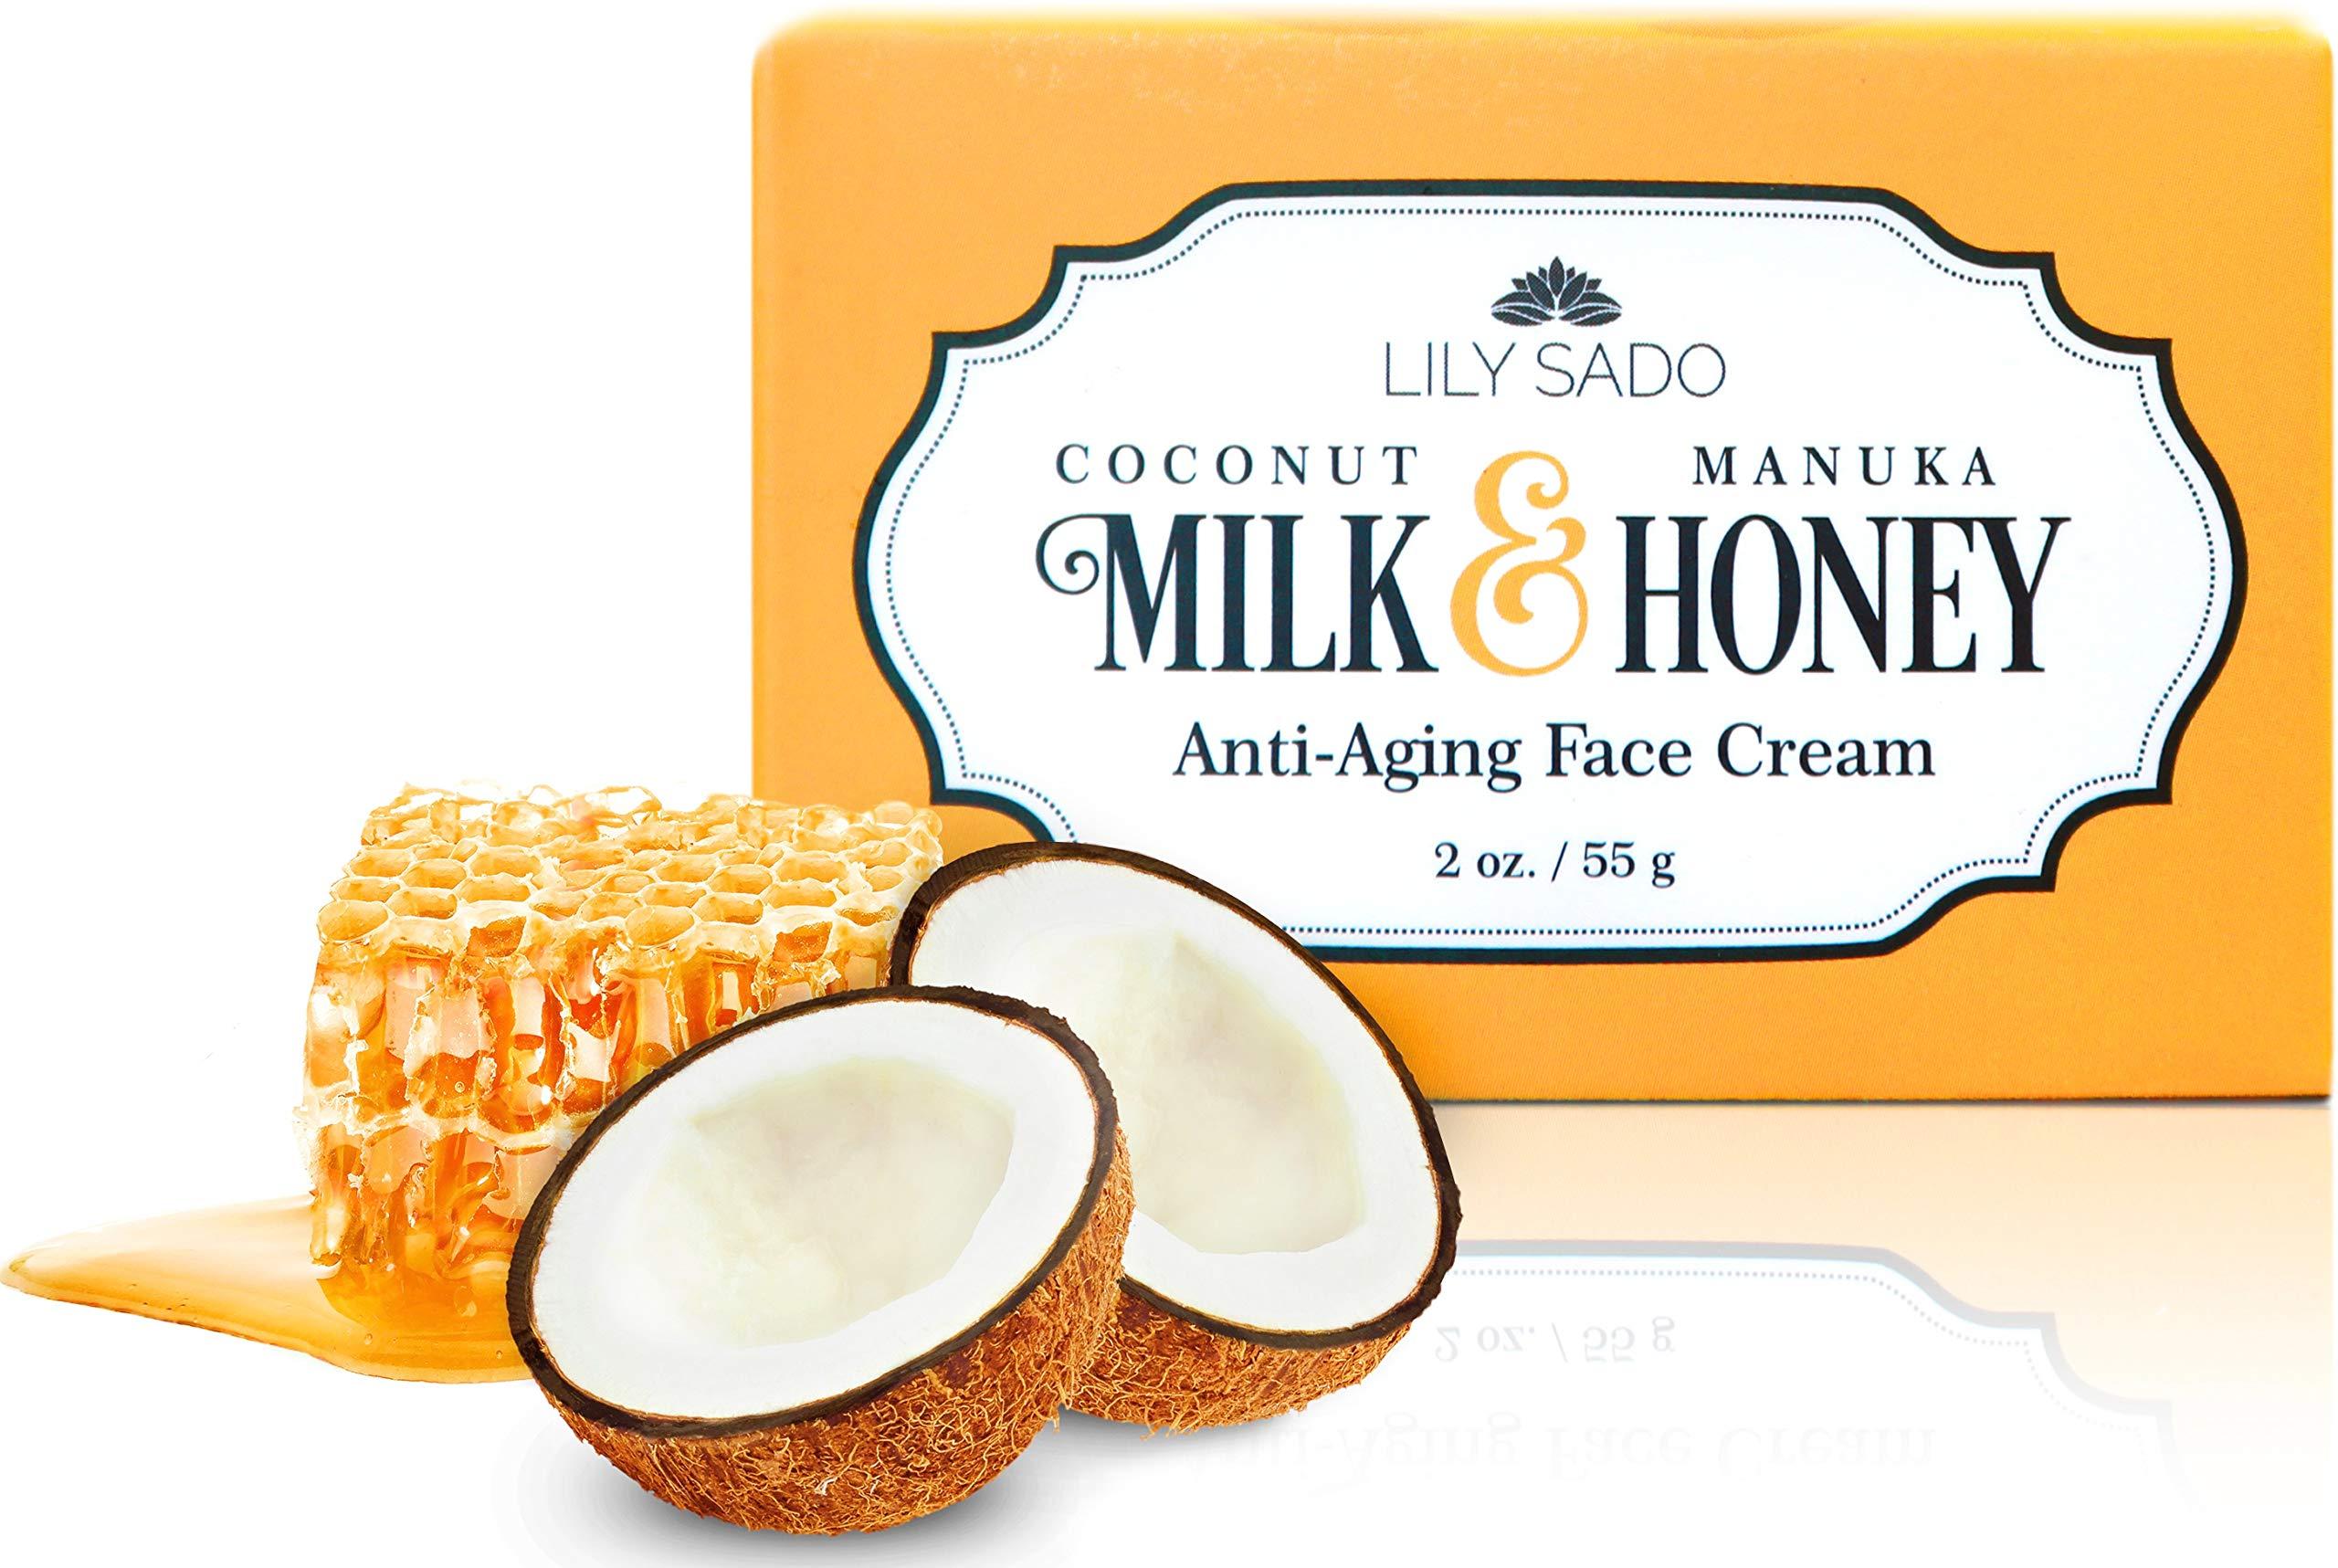 Coconut Milk + Manuka Honey Natural Face Moisturizer - Non Greasy Daily Facial Cream with Aloe